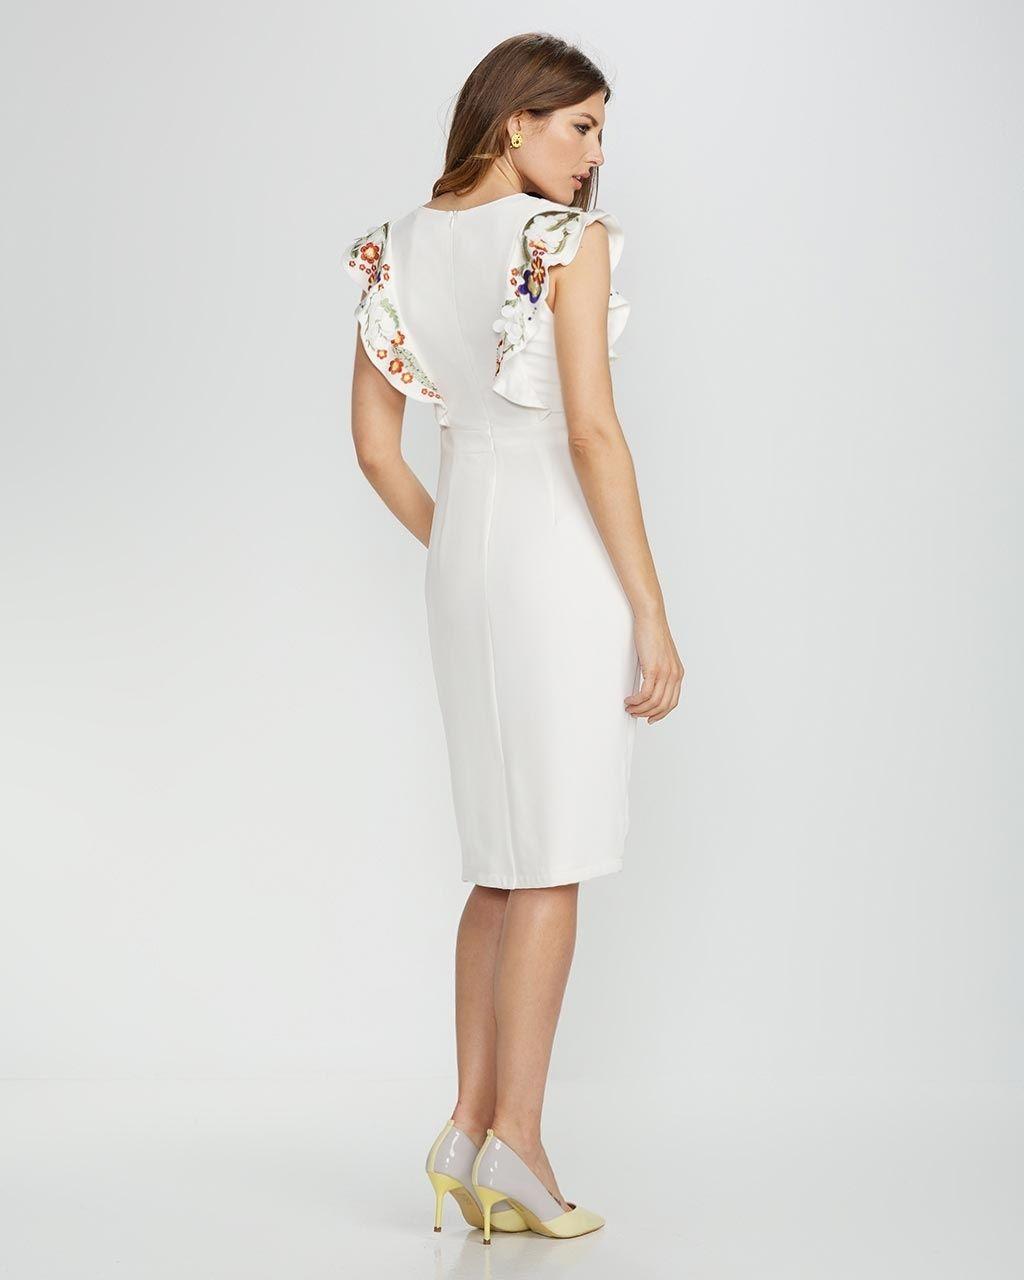 Revenda -  Vestido com bordado AXEL